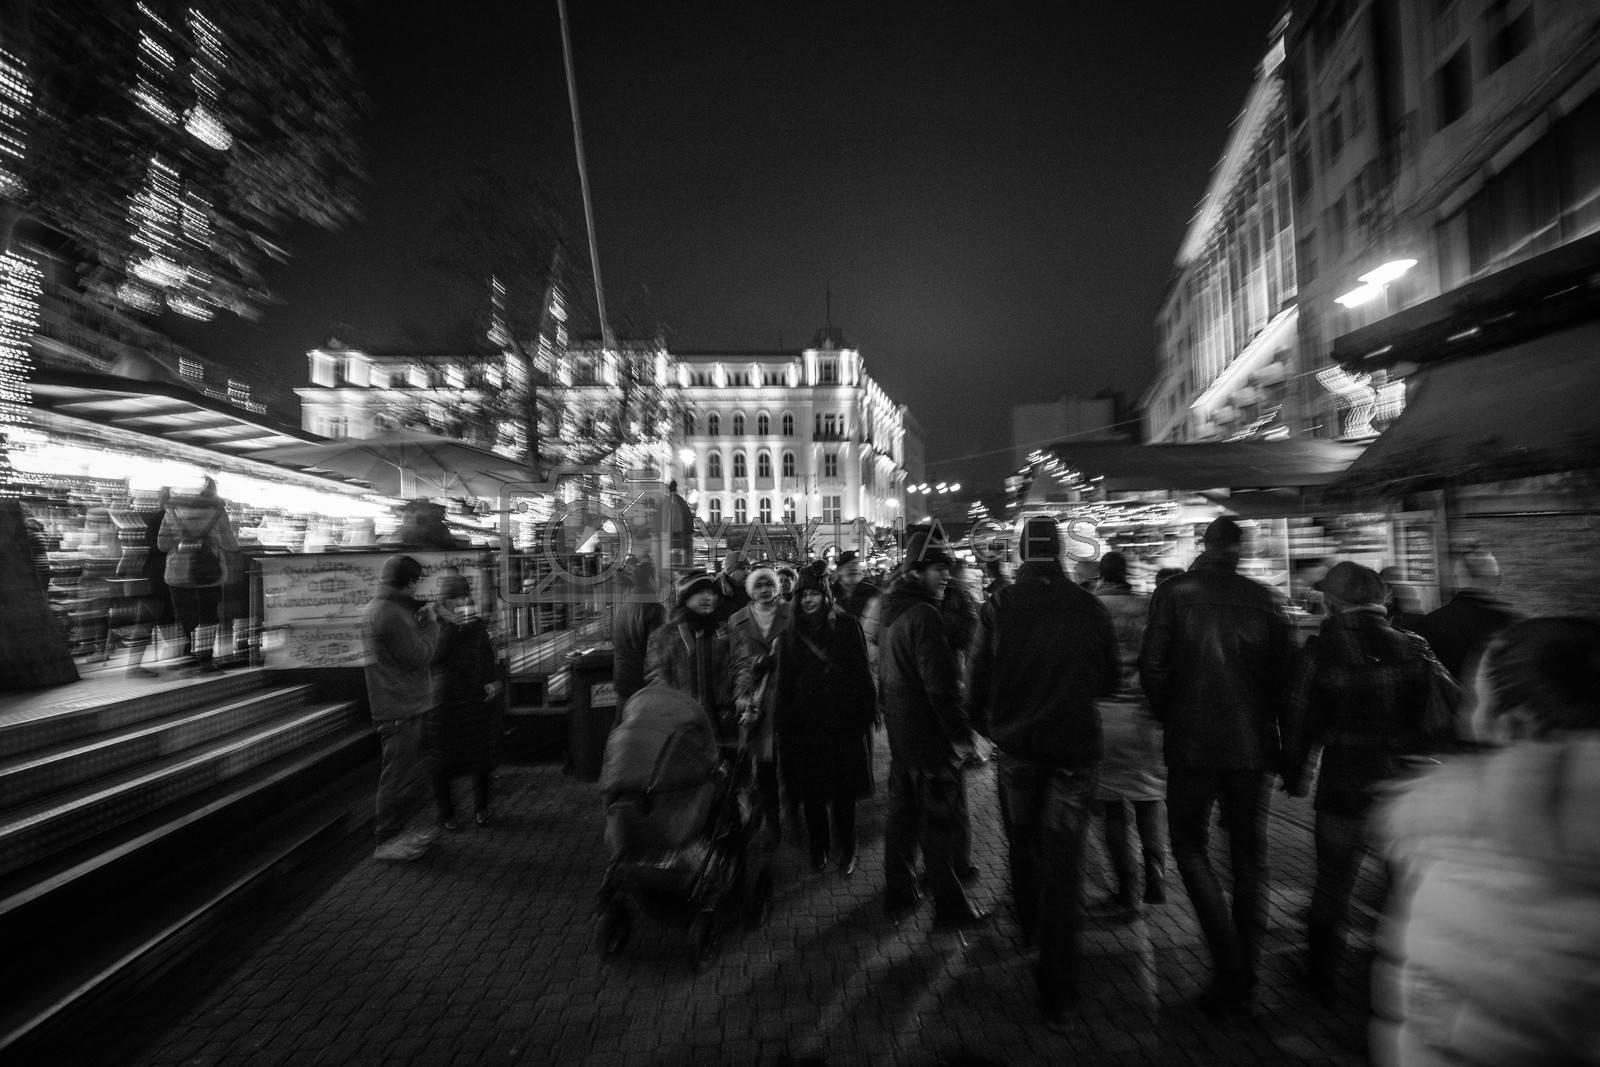 Christmas Market at the Vörösmarty Tér in Budapest, Hungary